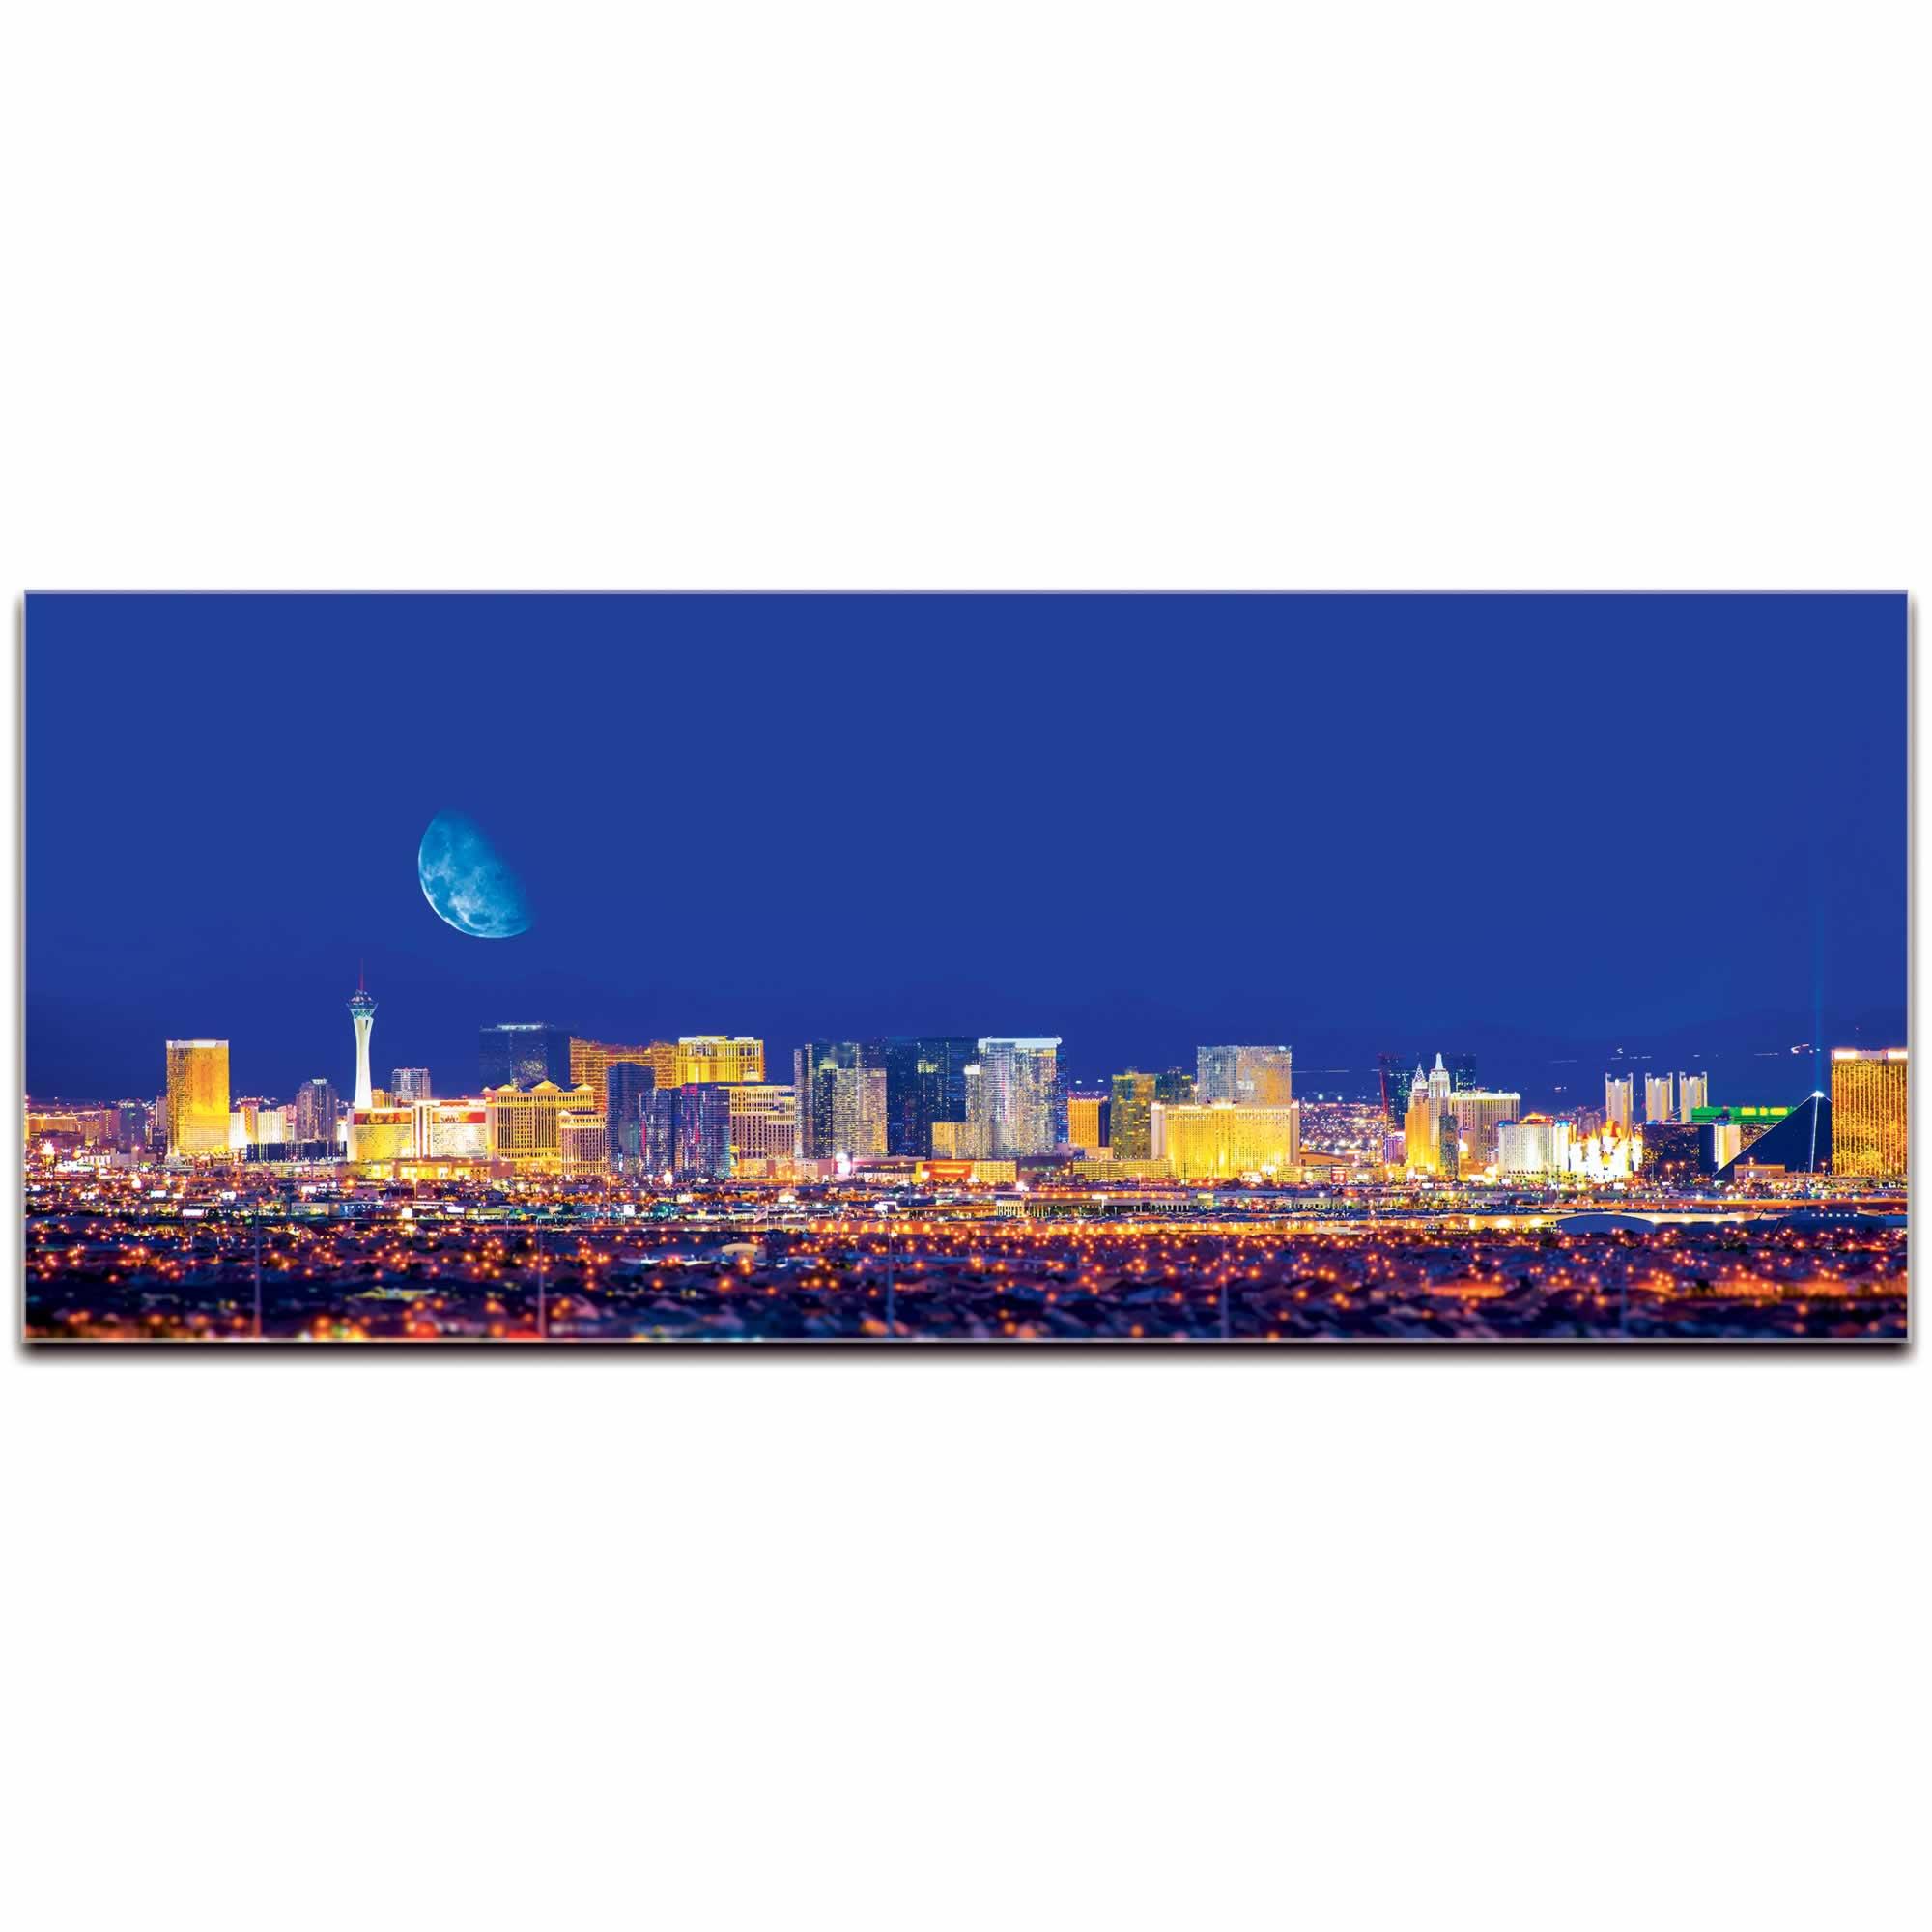 Las Vegas City Skyline - Urban Modern Art, Designer Home Decor, Cityscape Wall Artwork, Trendy Contemporary Art